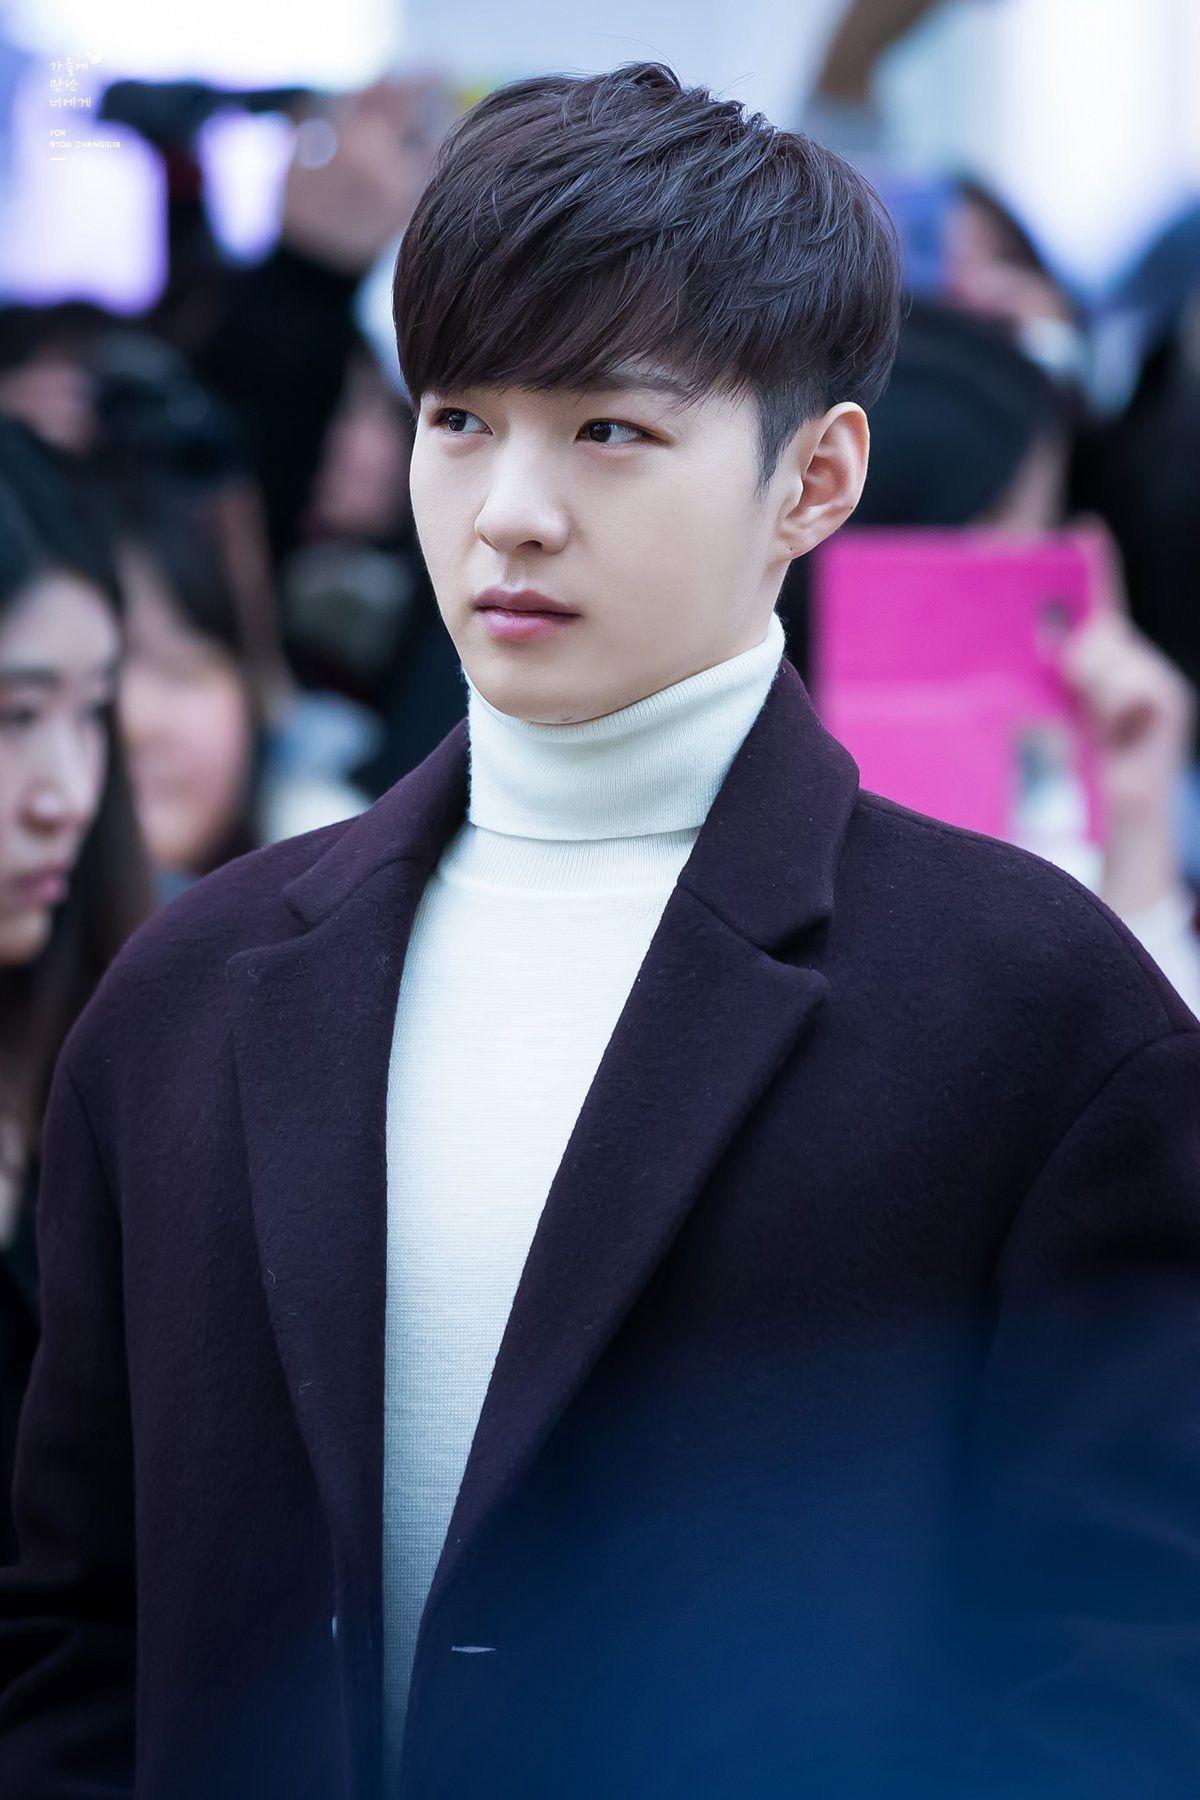 Examplary 101 trendy korean men hairstyle ideas 2020 king